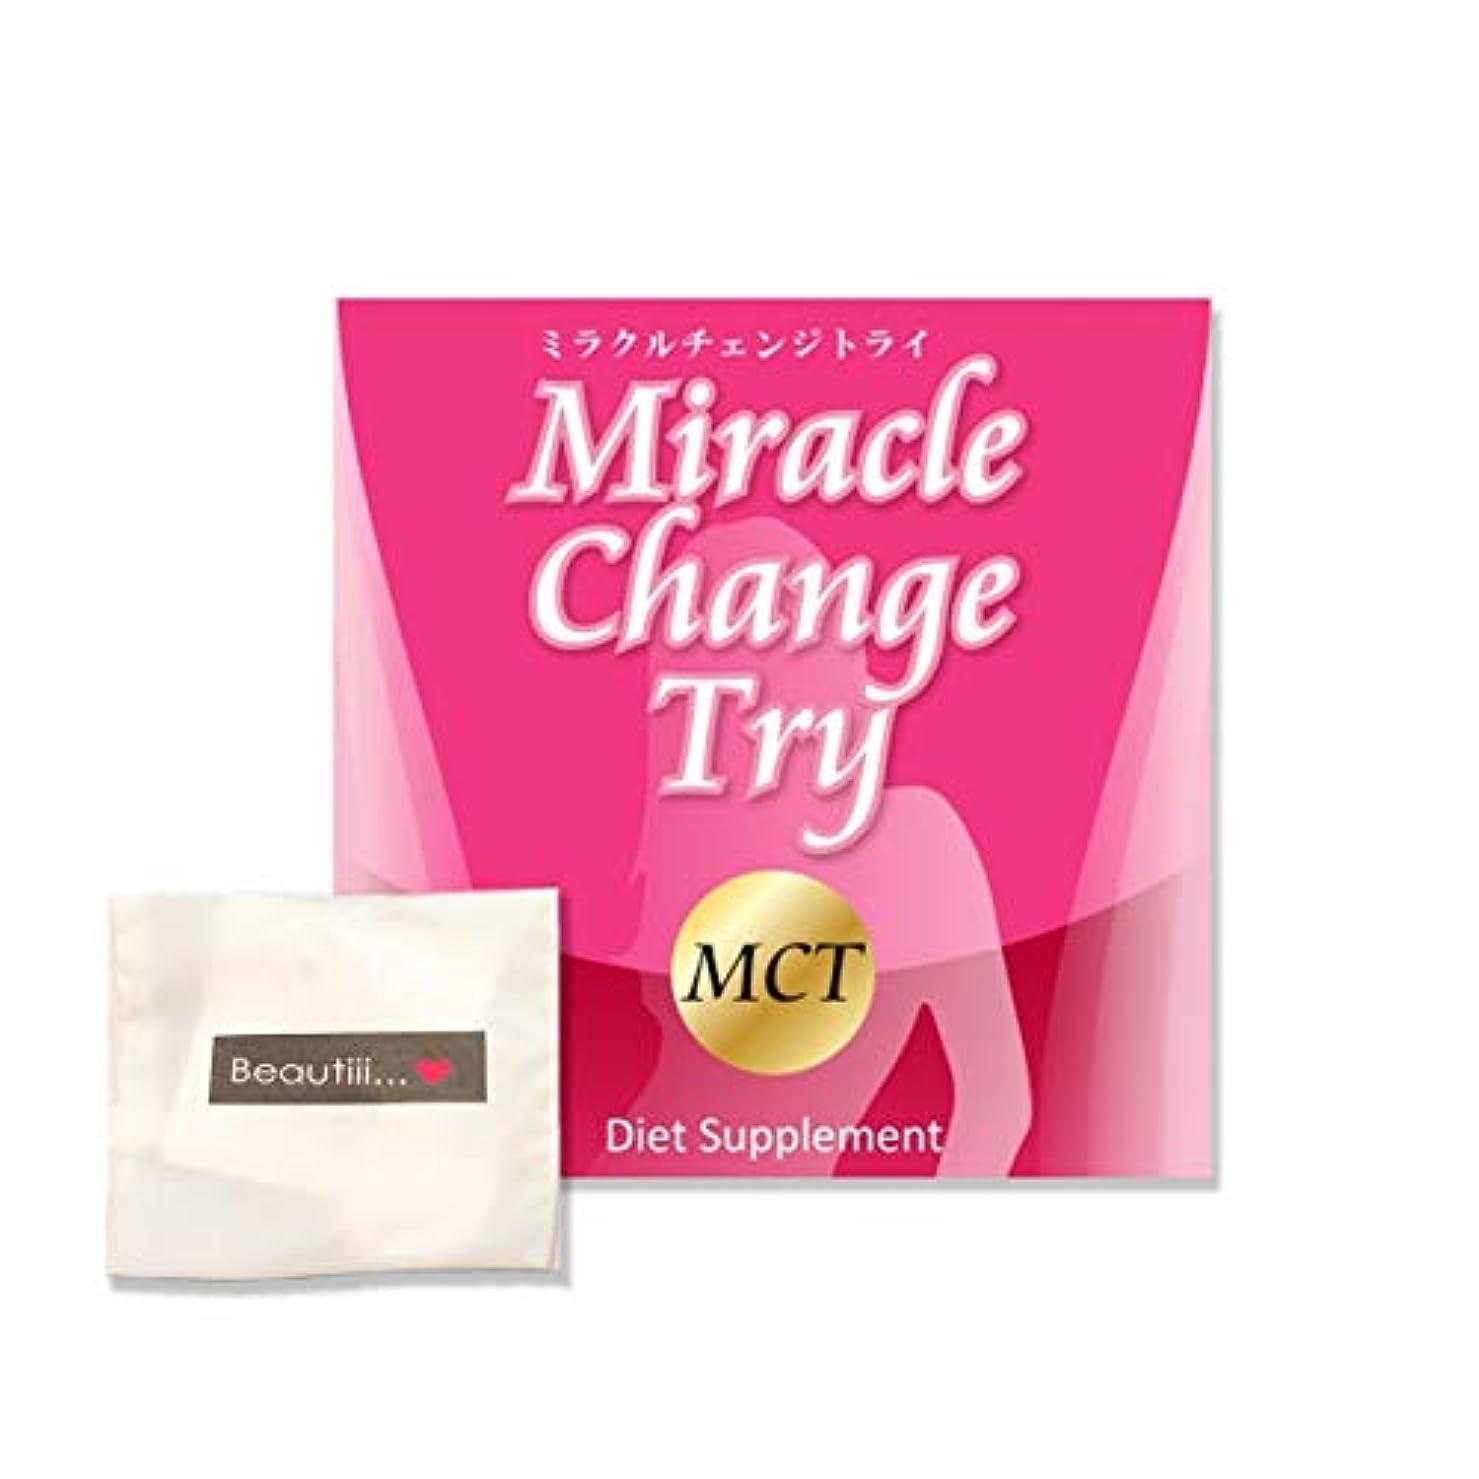 Beautiiiセット & Miracle Change Try ミラクルチェンジトライ 60粒【ギフトセット】SNSで話題!大人気!